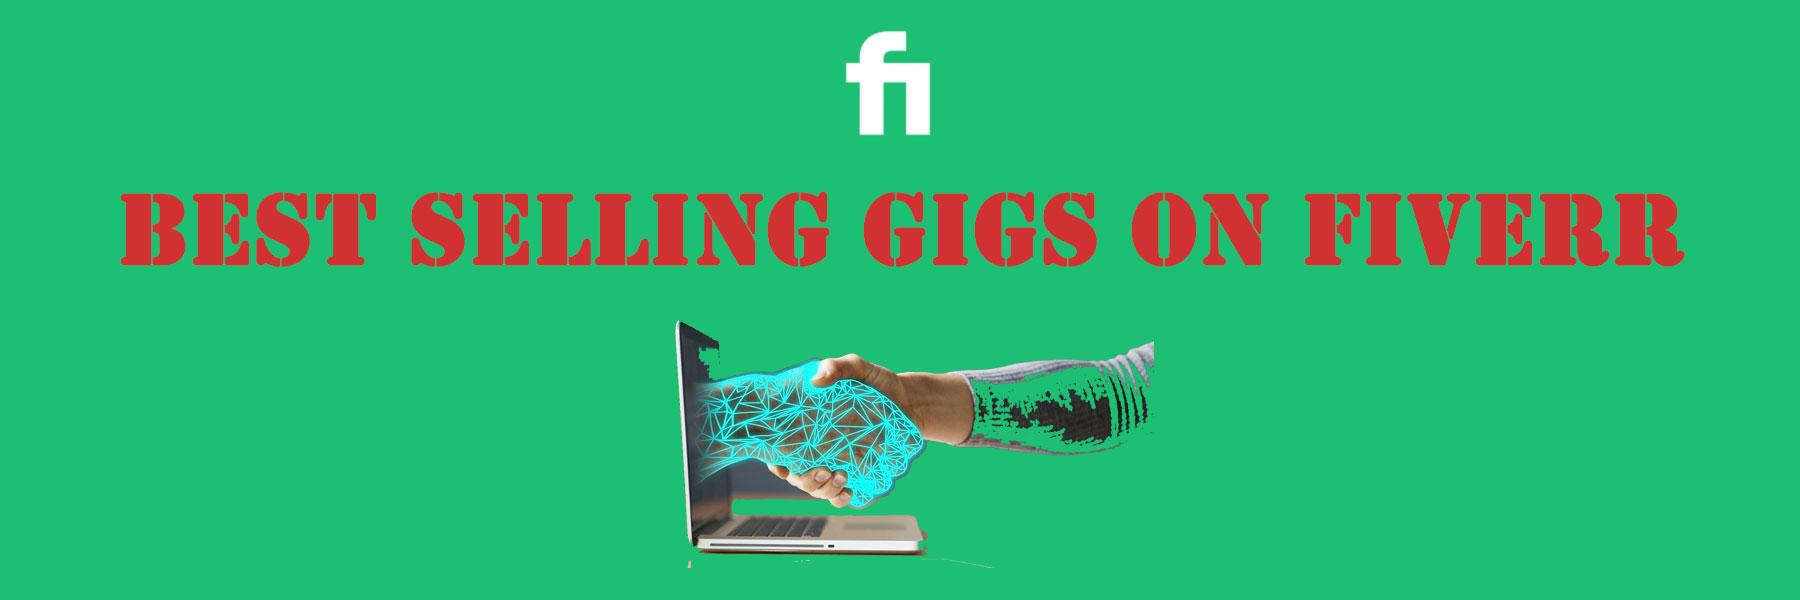 best selling gigs on Fiverr